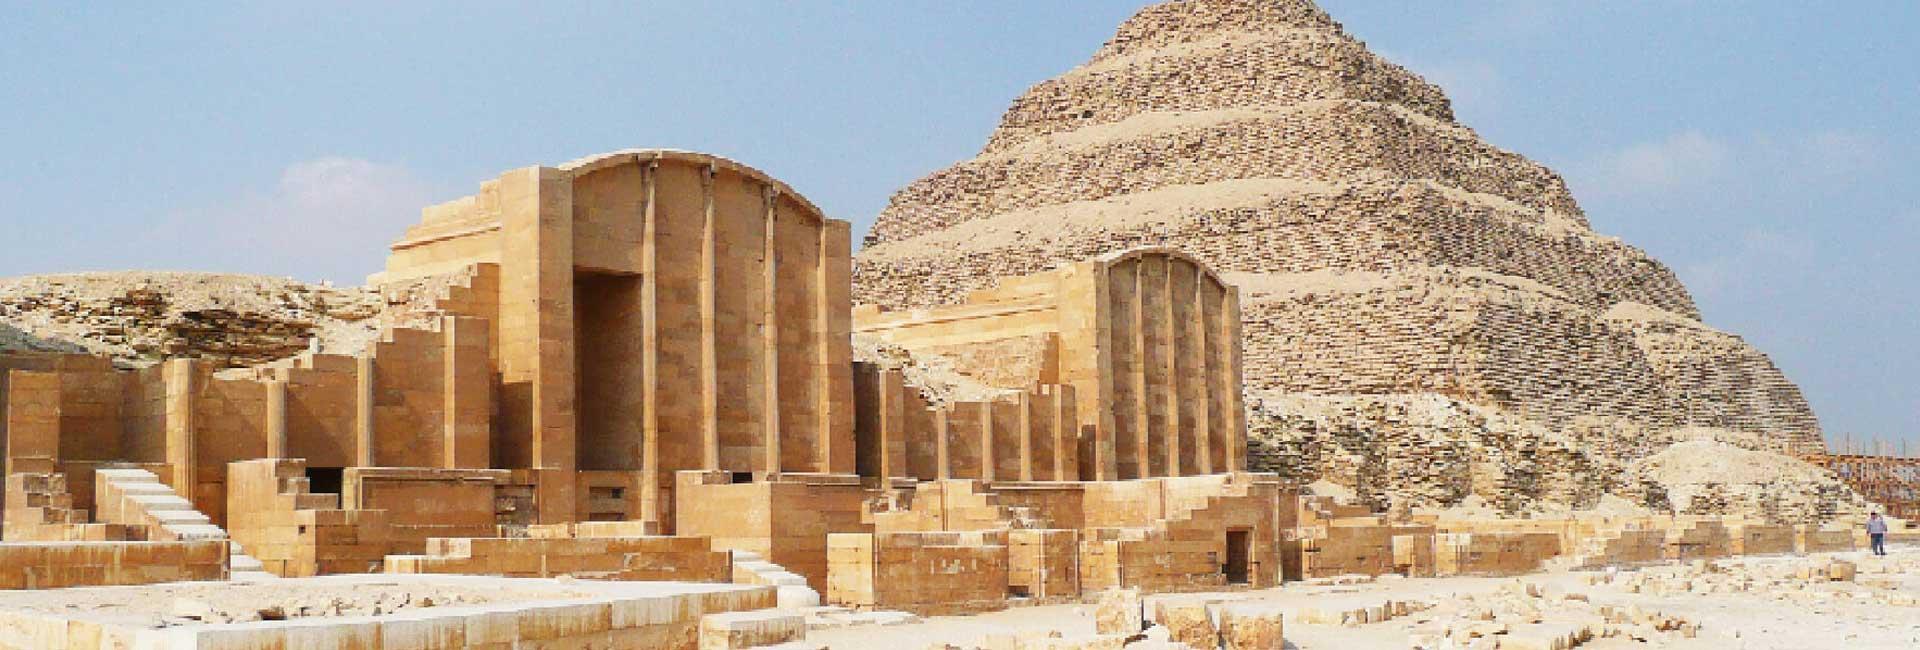 Pyramids Of Dahsur